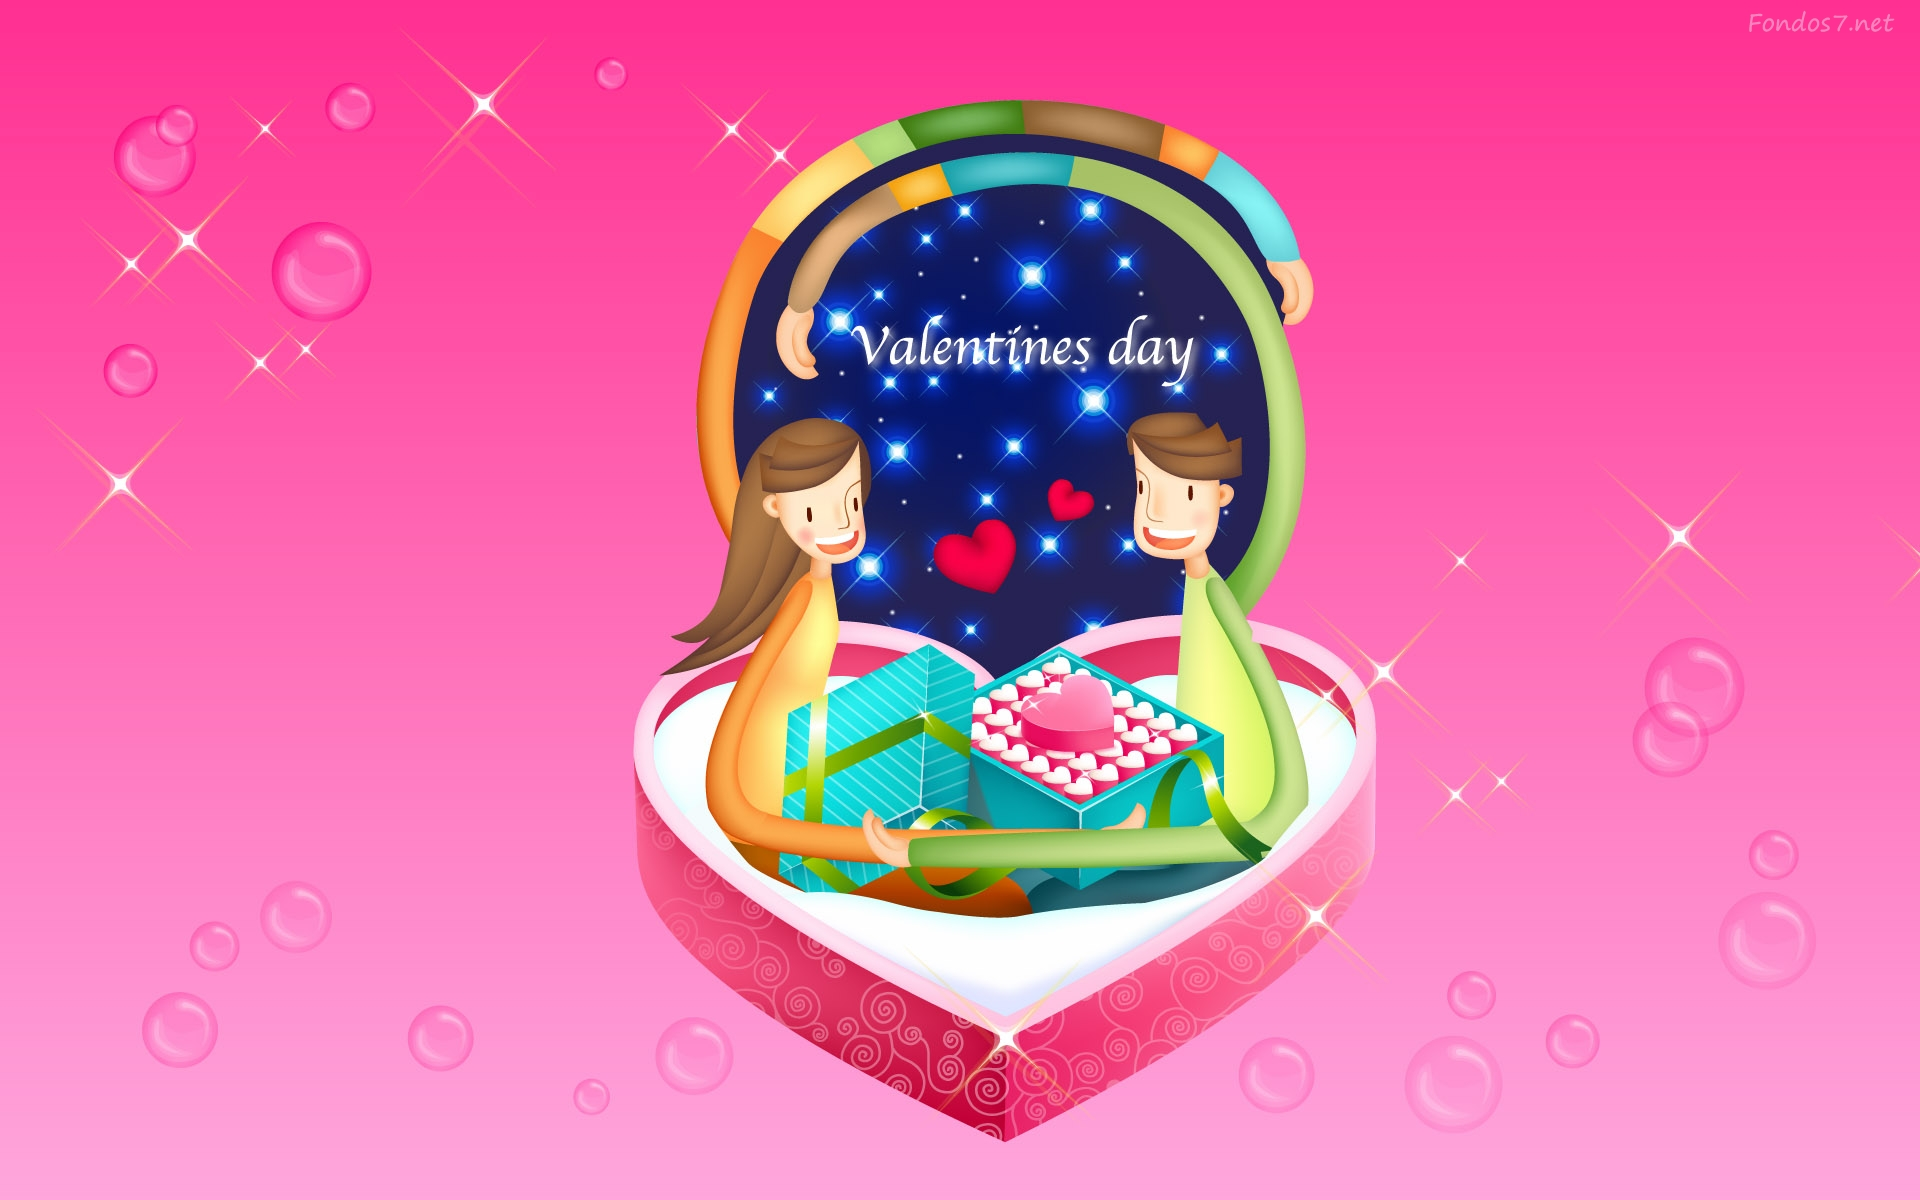 Fondos De Pantalla San Valentin Gratis: Wallpaper San Valentin